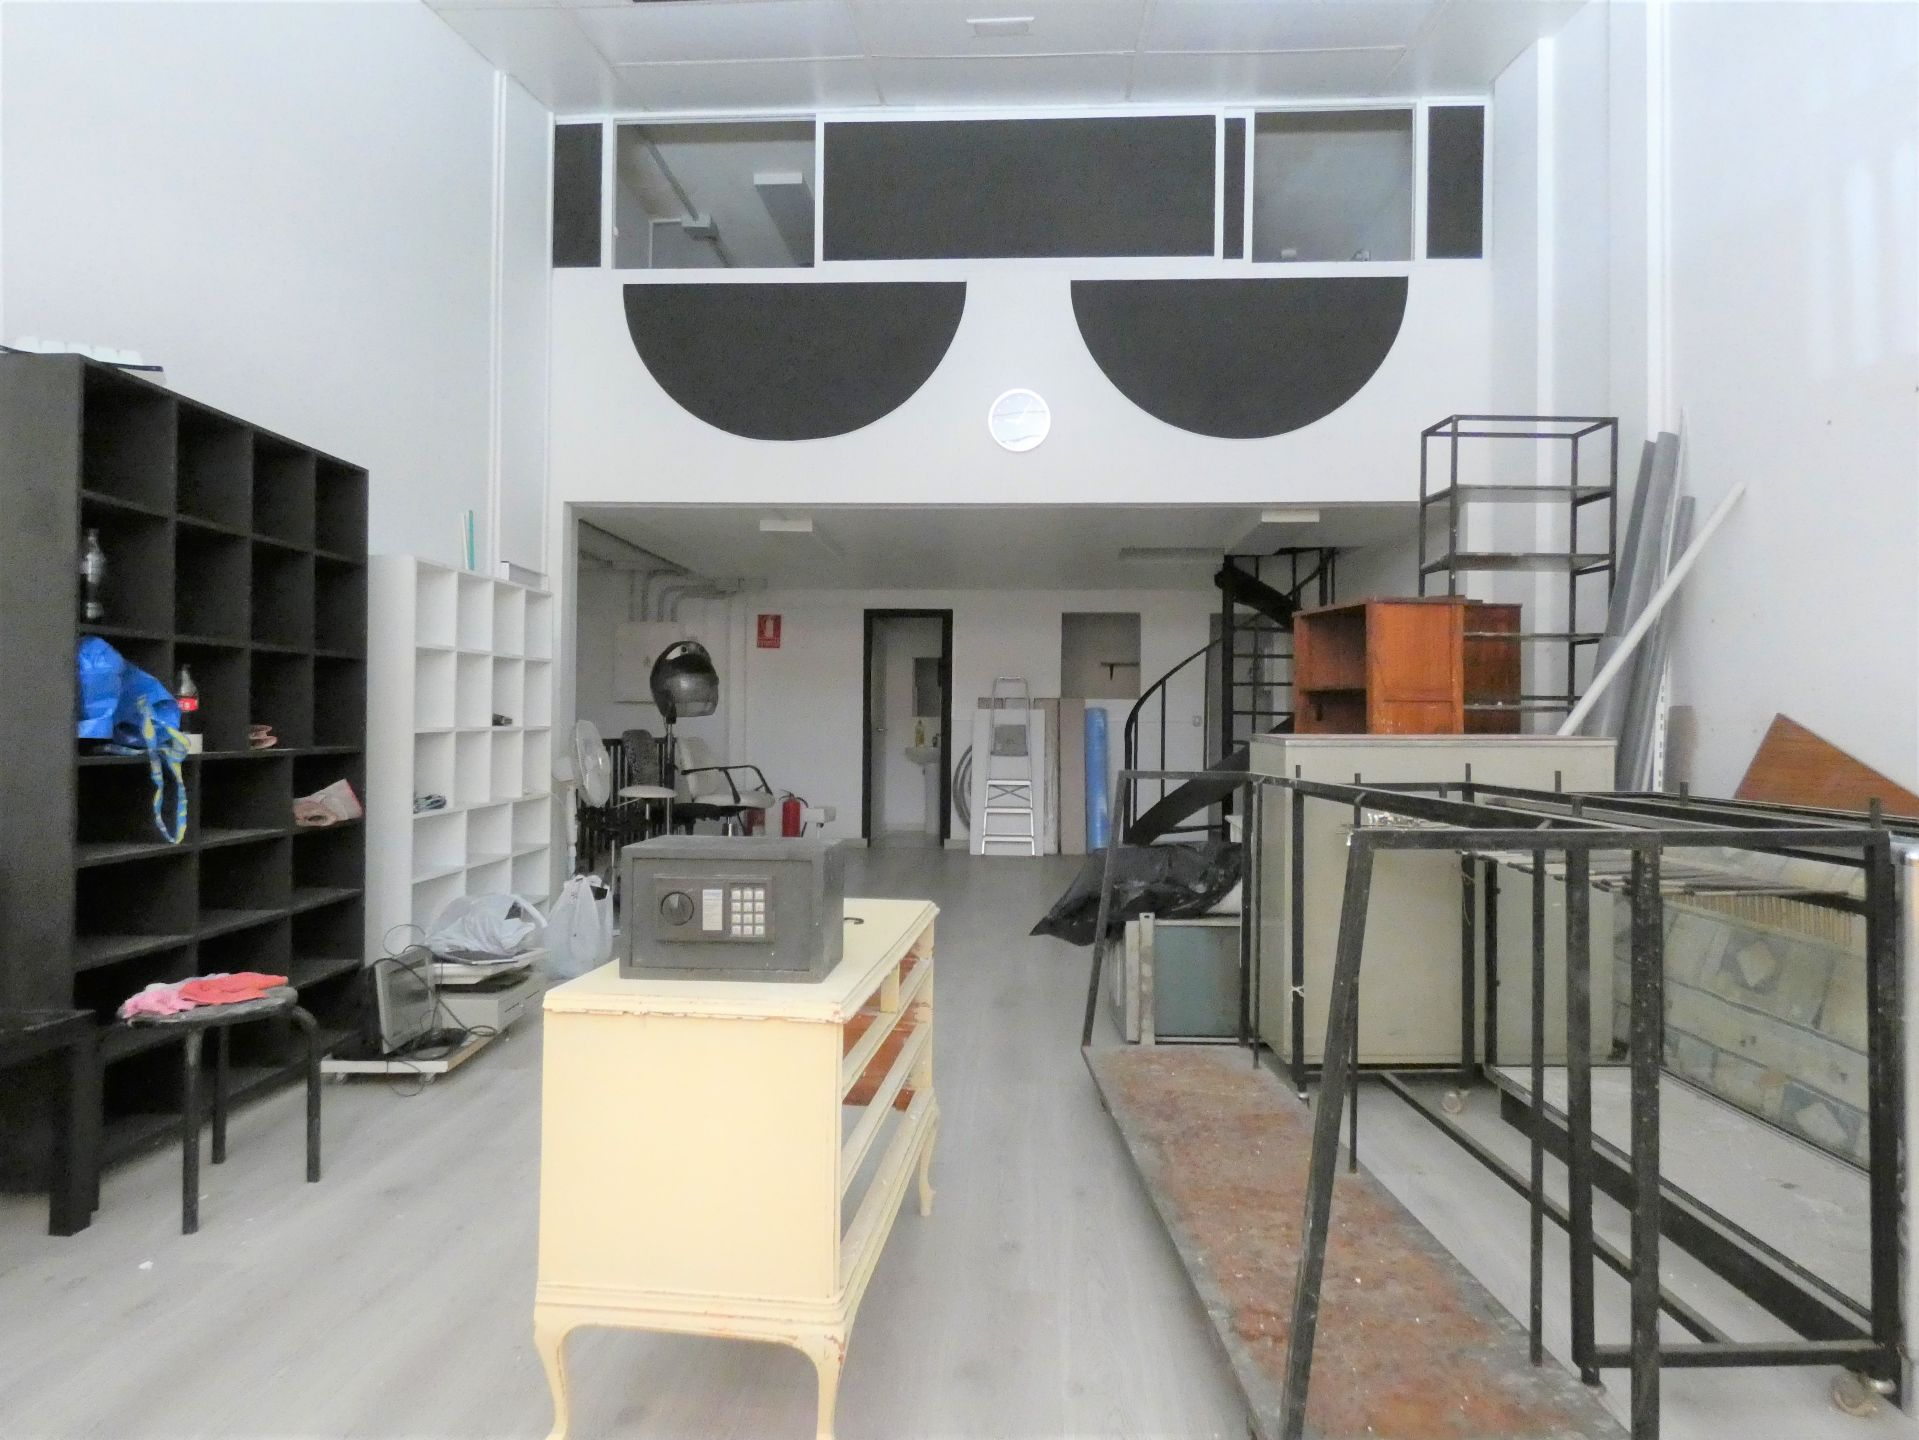 Local comercial en Santa Cruz de Tenerife, CENTRO, alquiler